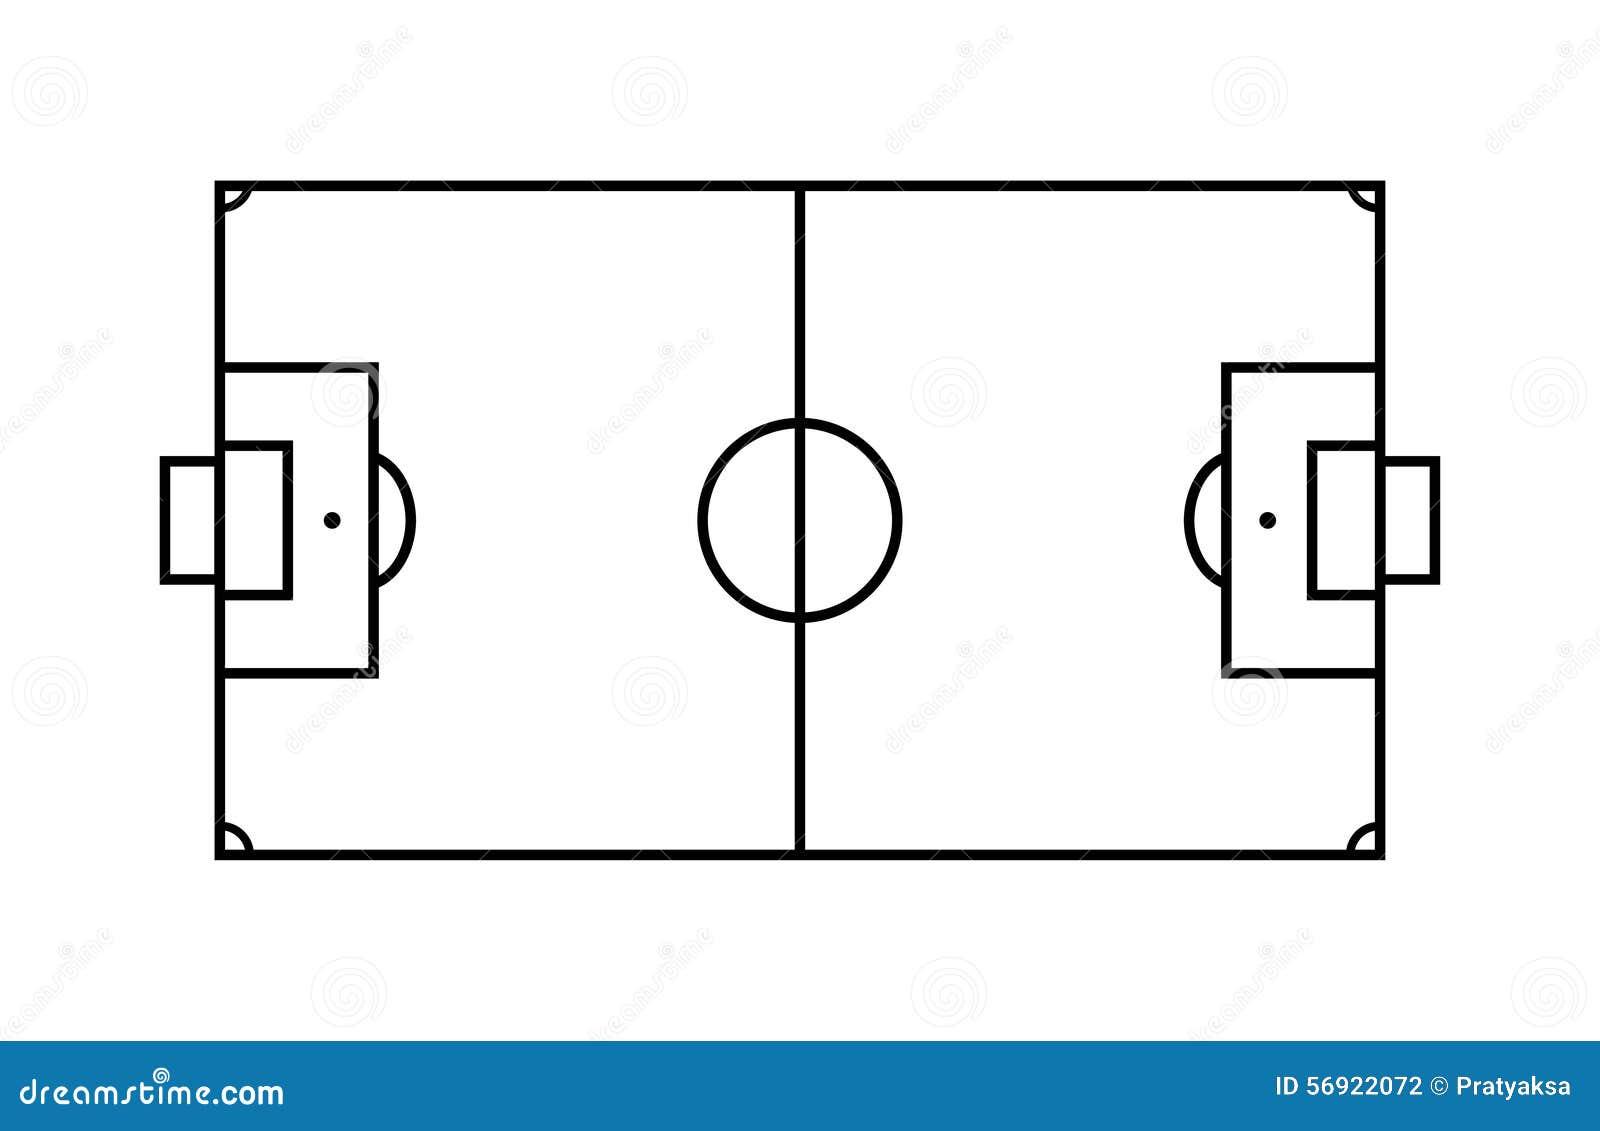 Soccer field positions template minicat soccer field positions template pooptronica Choice Image